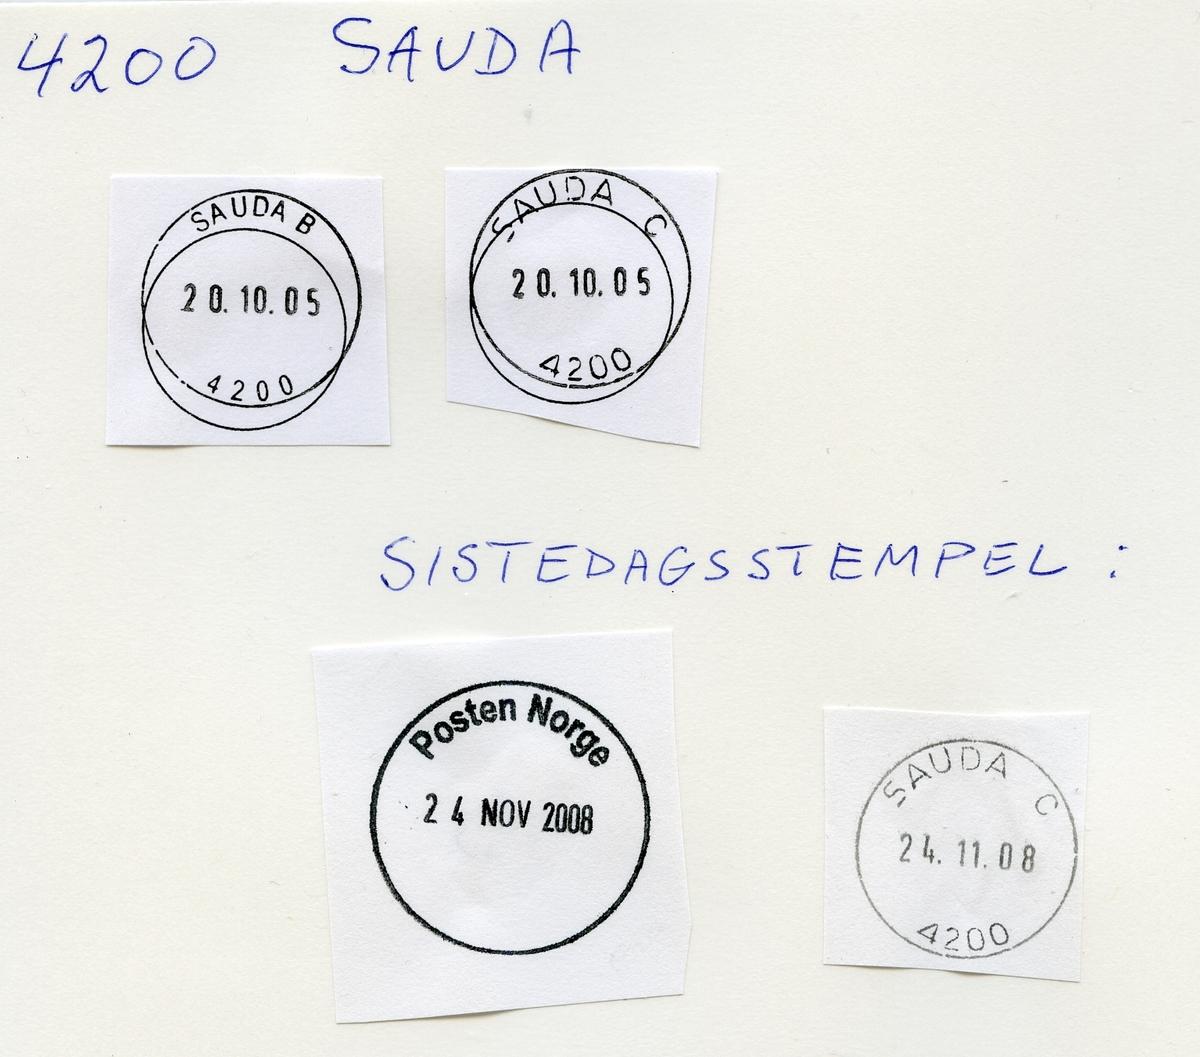 Stempelkatalog 4200 Sauda, Sauda, Rogaland